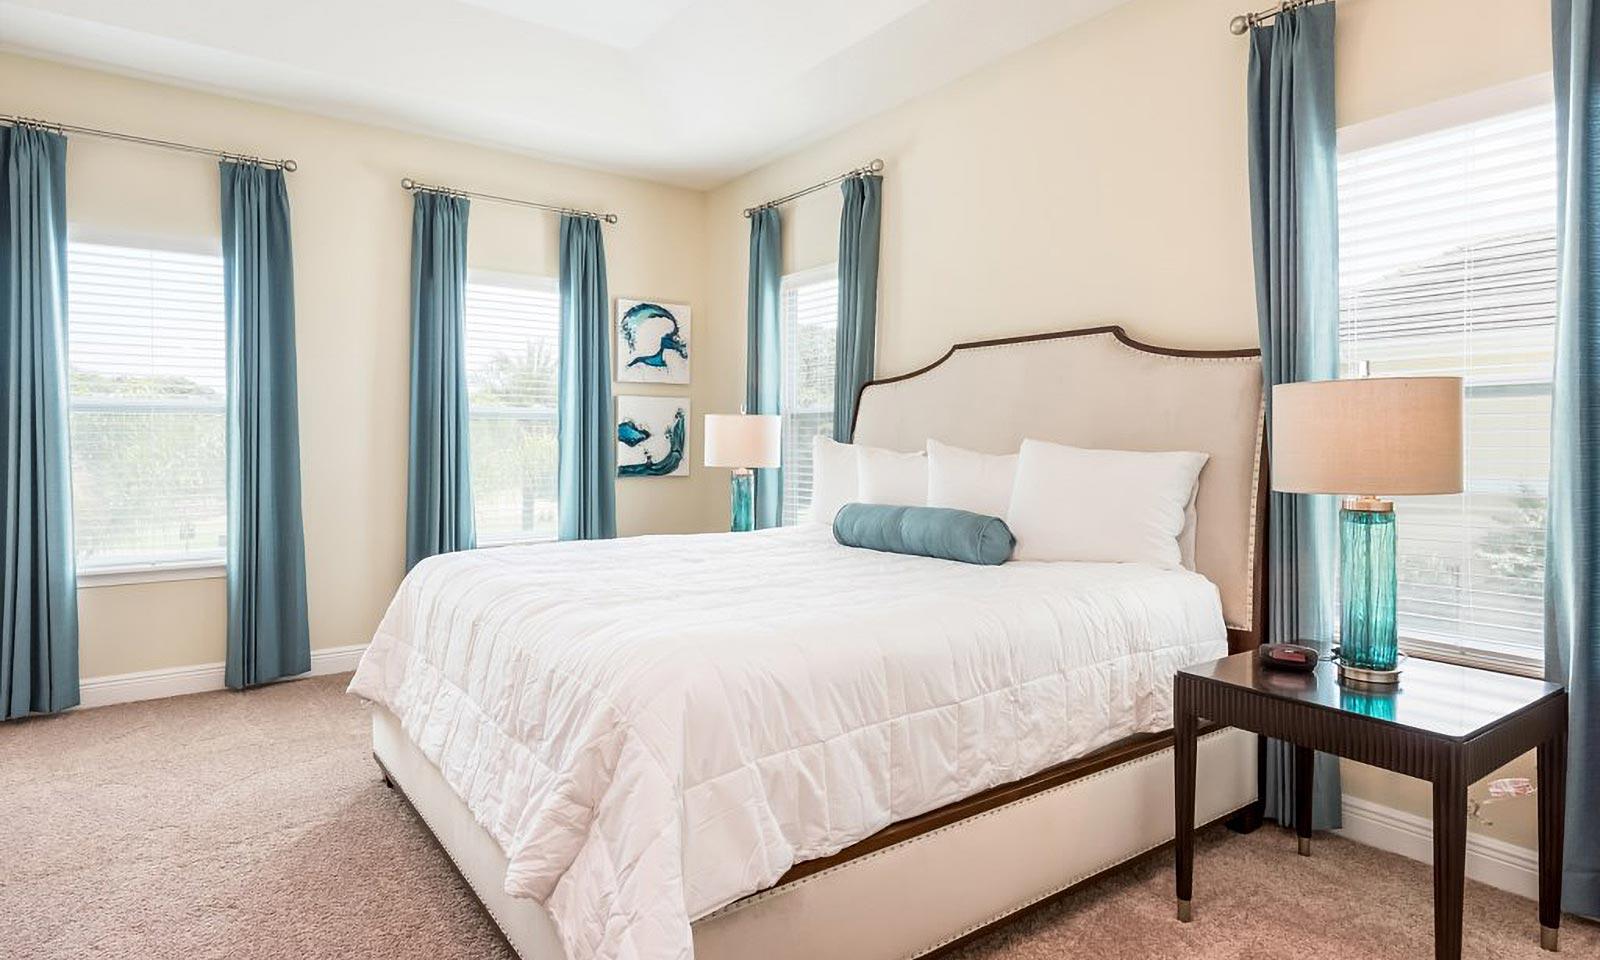 [amenities:Master-Beddroom:2] Master Bedroom